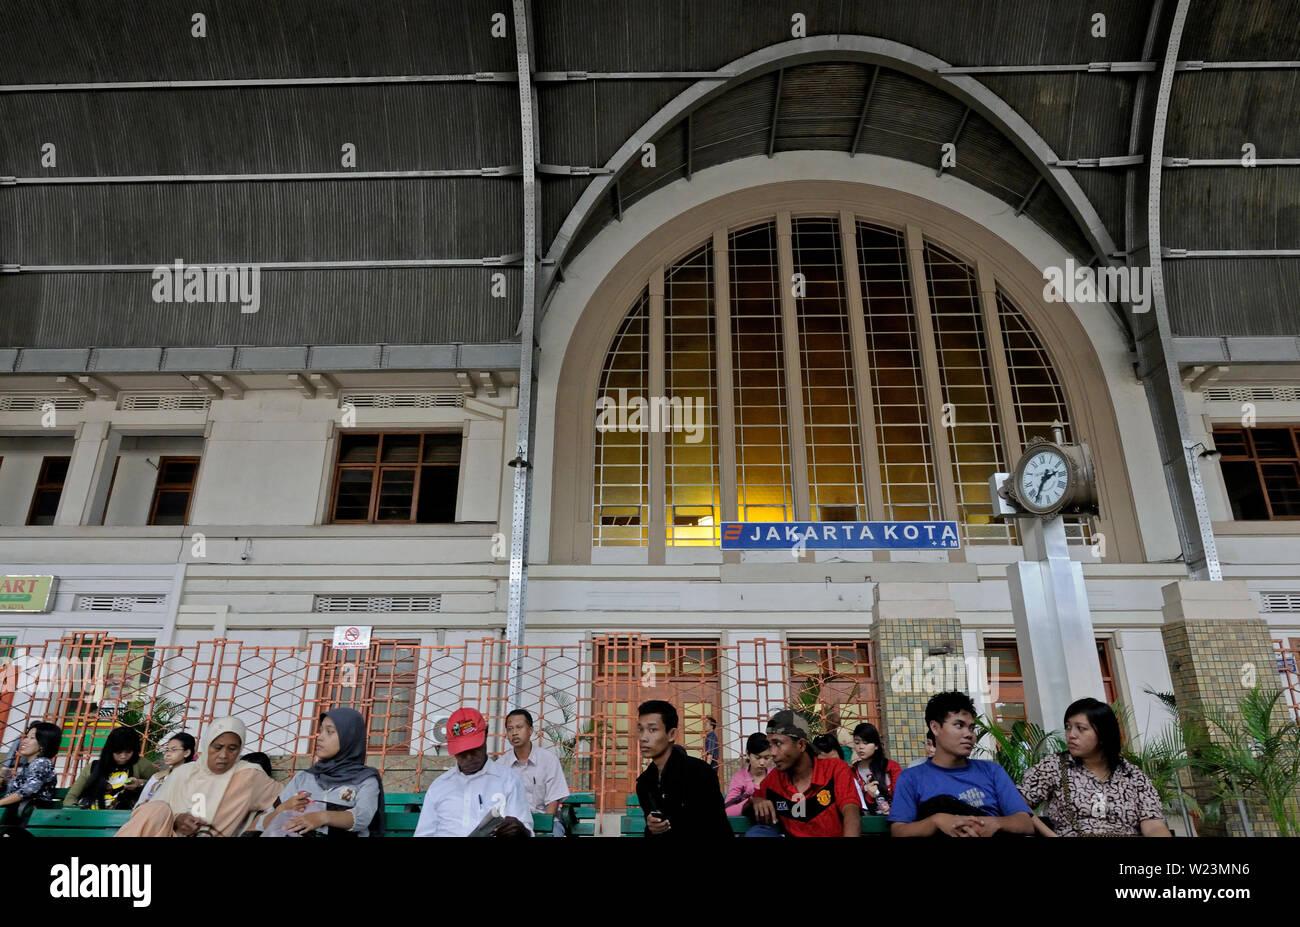 jakarta, dki jakarta/indonesia - may 05, 2010: people waiting in the concourse of kota railway station - Stock Image